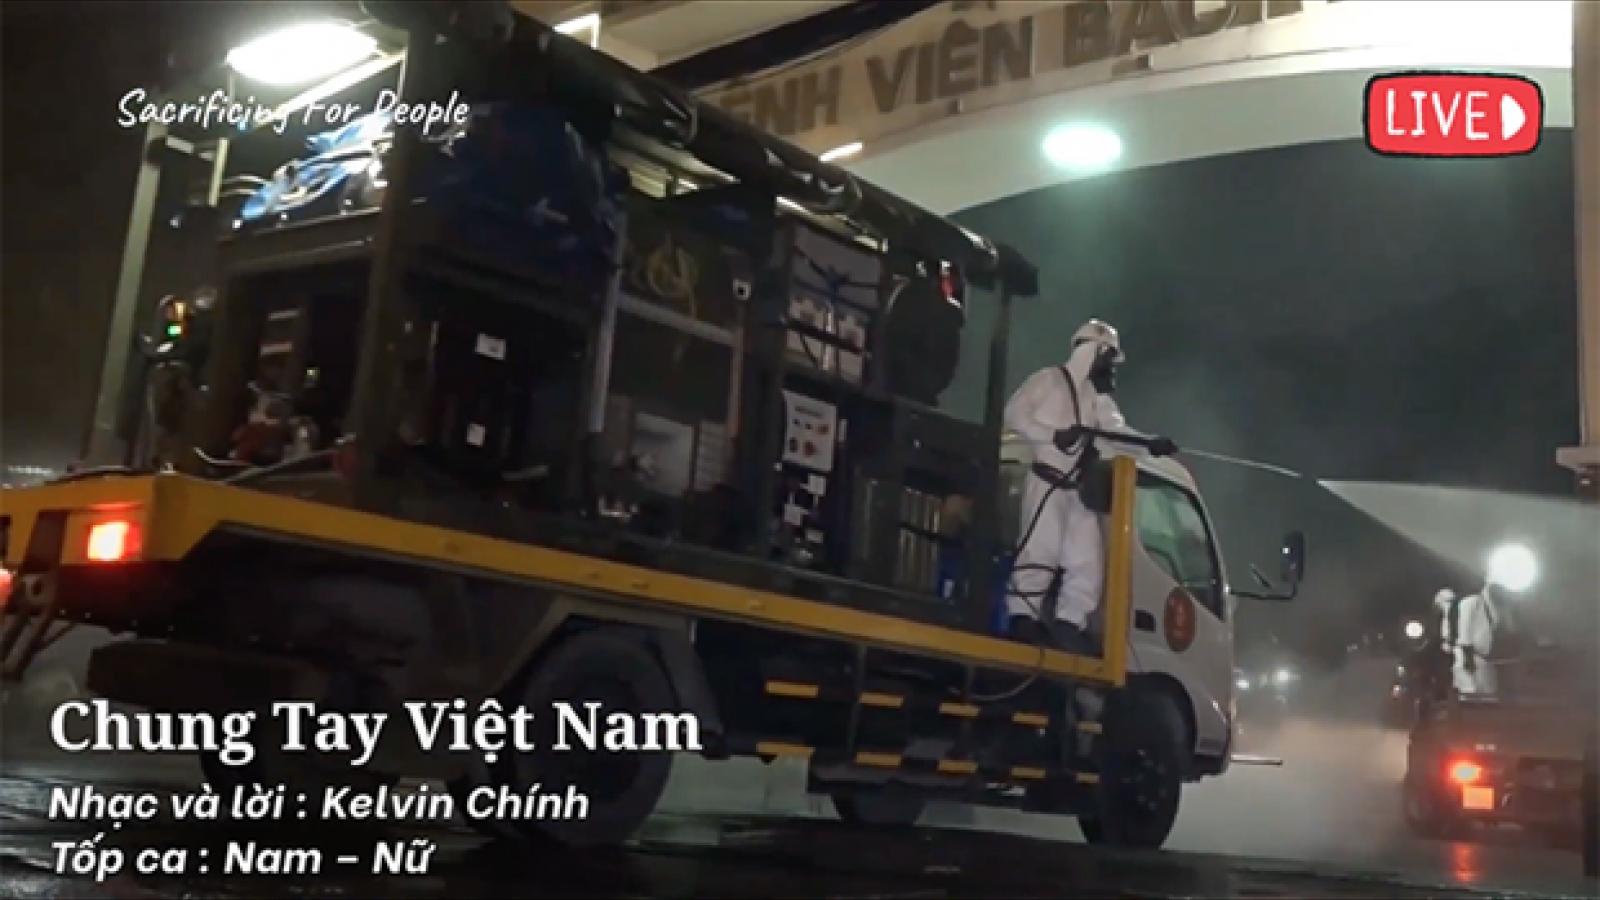 Hanoi releases songs encouraging COVID-19 fight